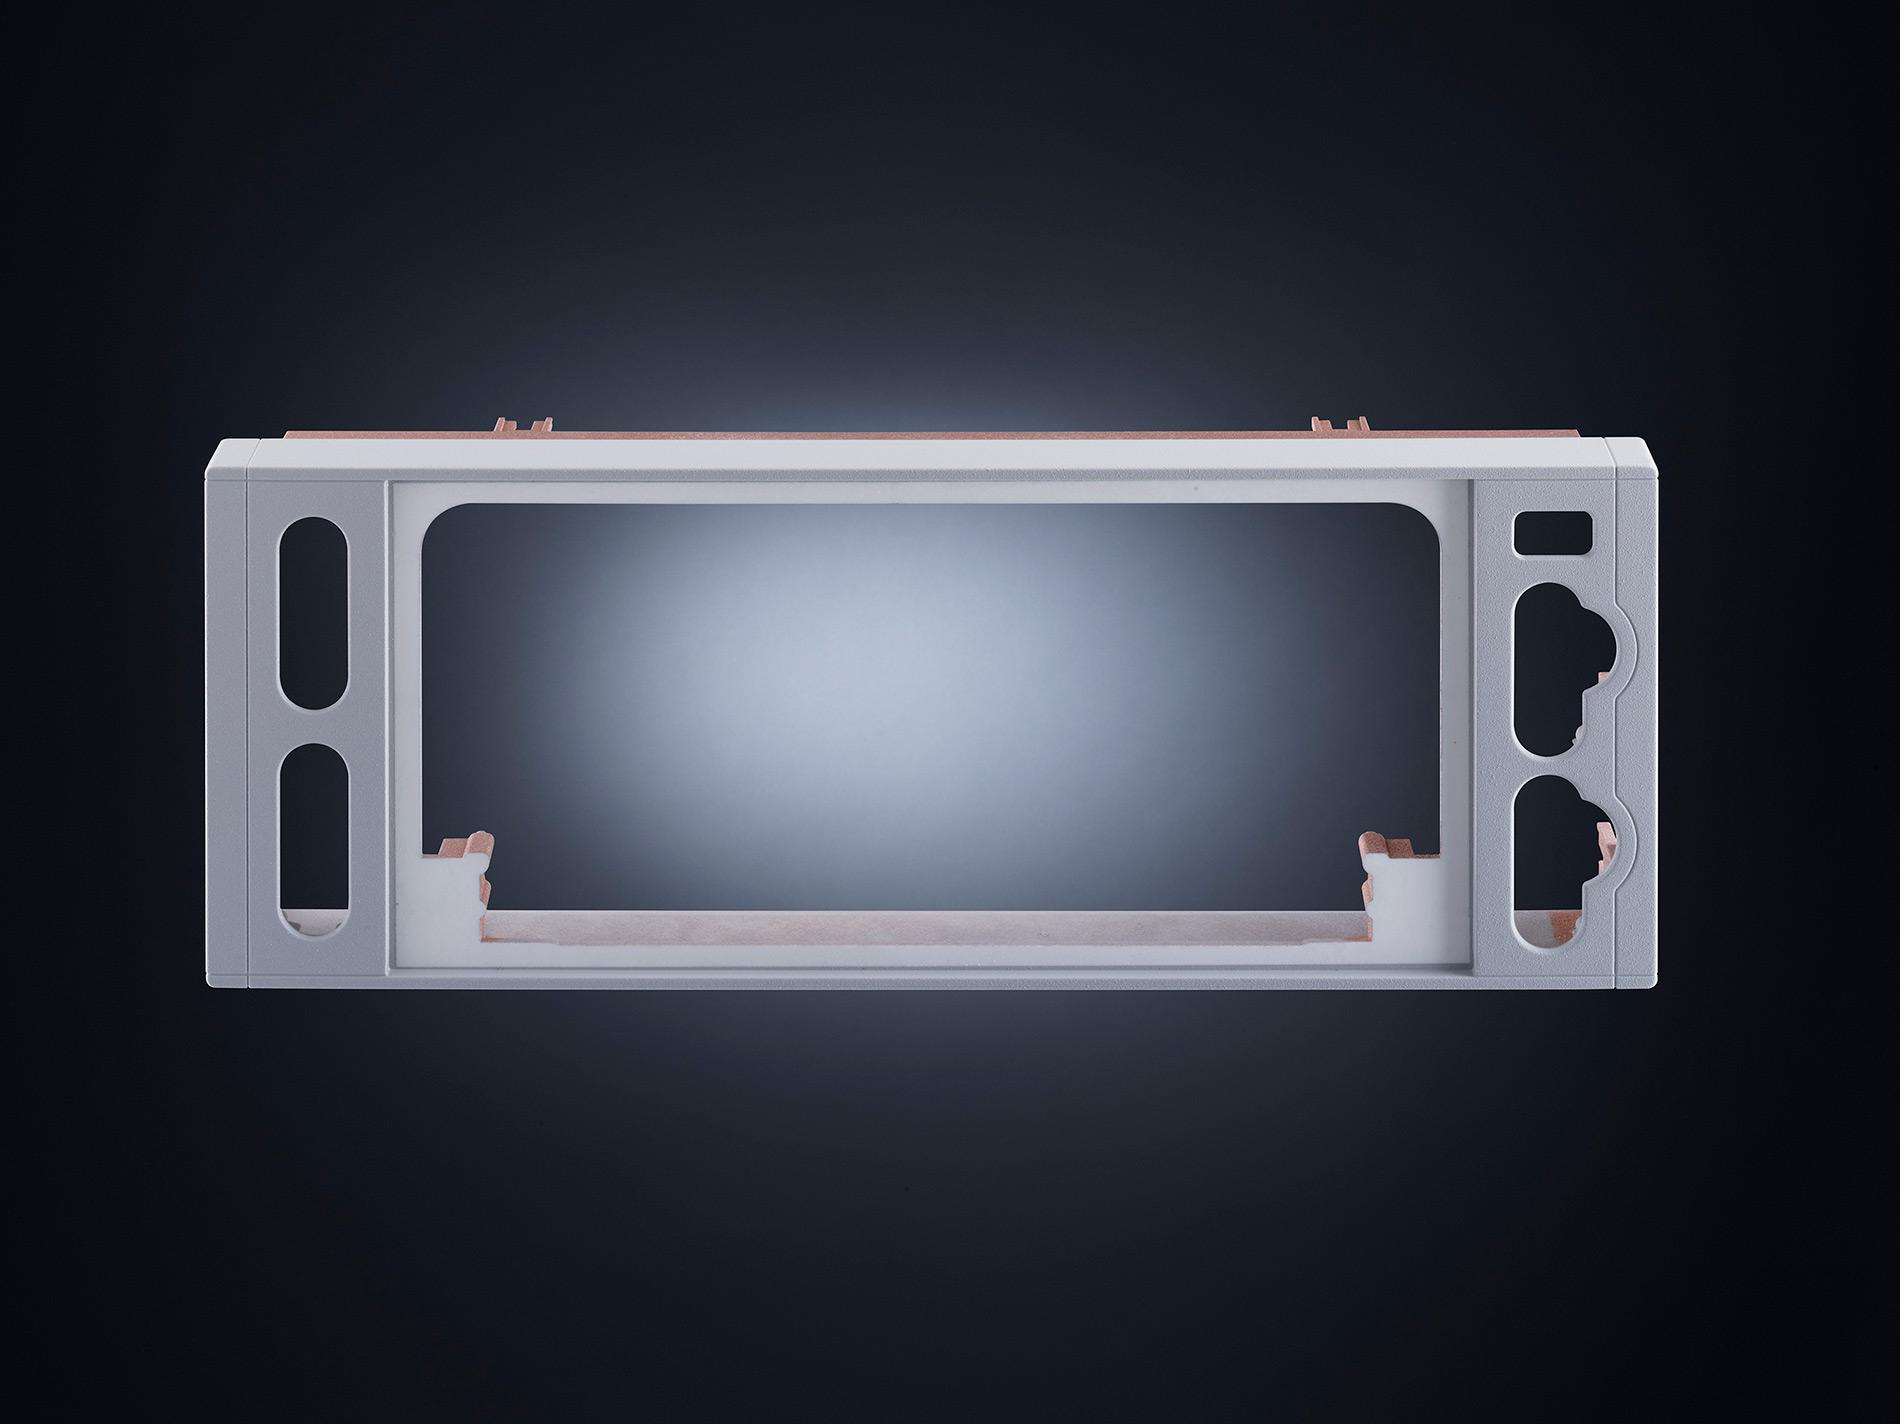 Fried Kunststofftechnik stellt Kunststoffteile für die Elektrochirurgie her.